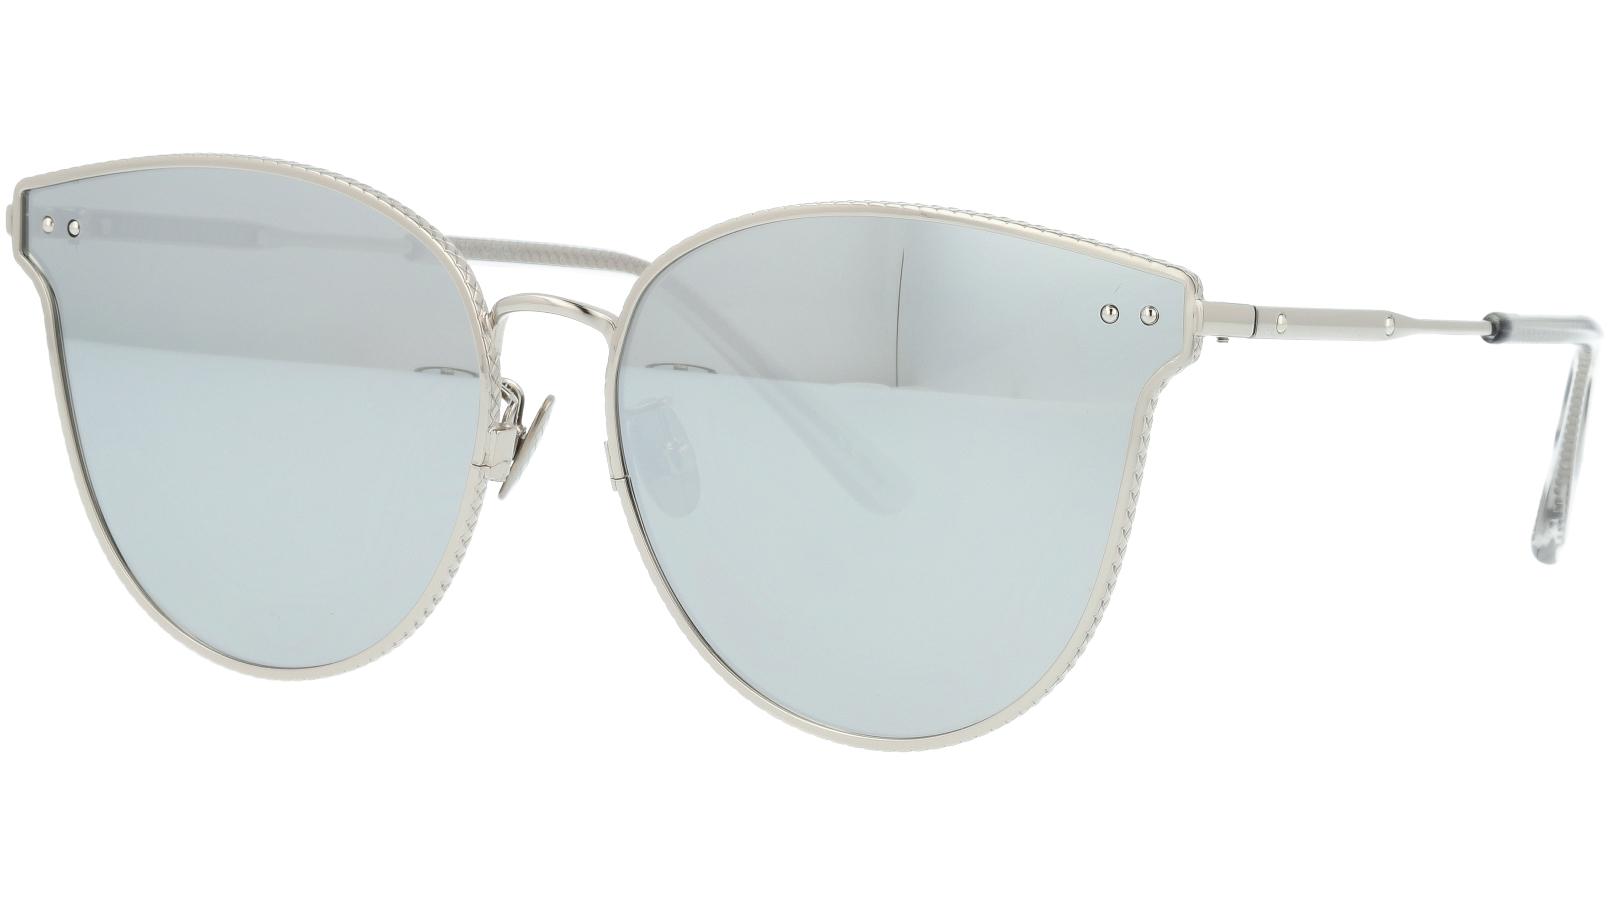 BOTTEGA VENETA BV0157SK 002 63 SILVER Sunglasses